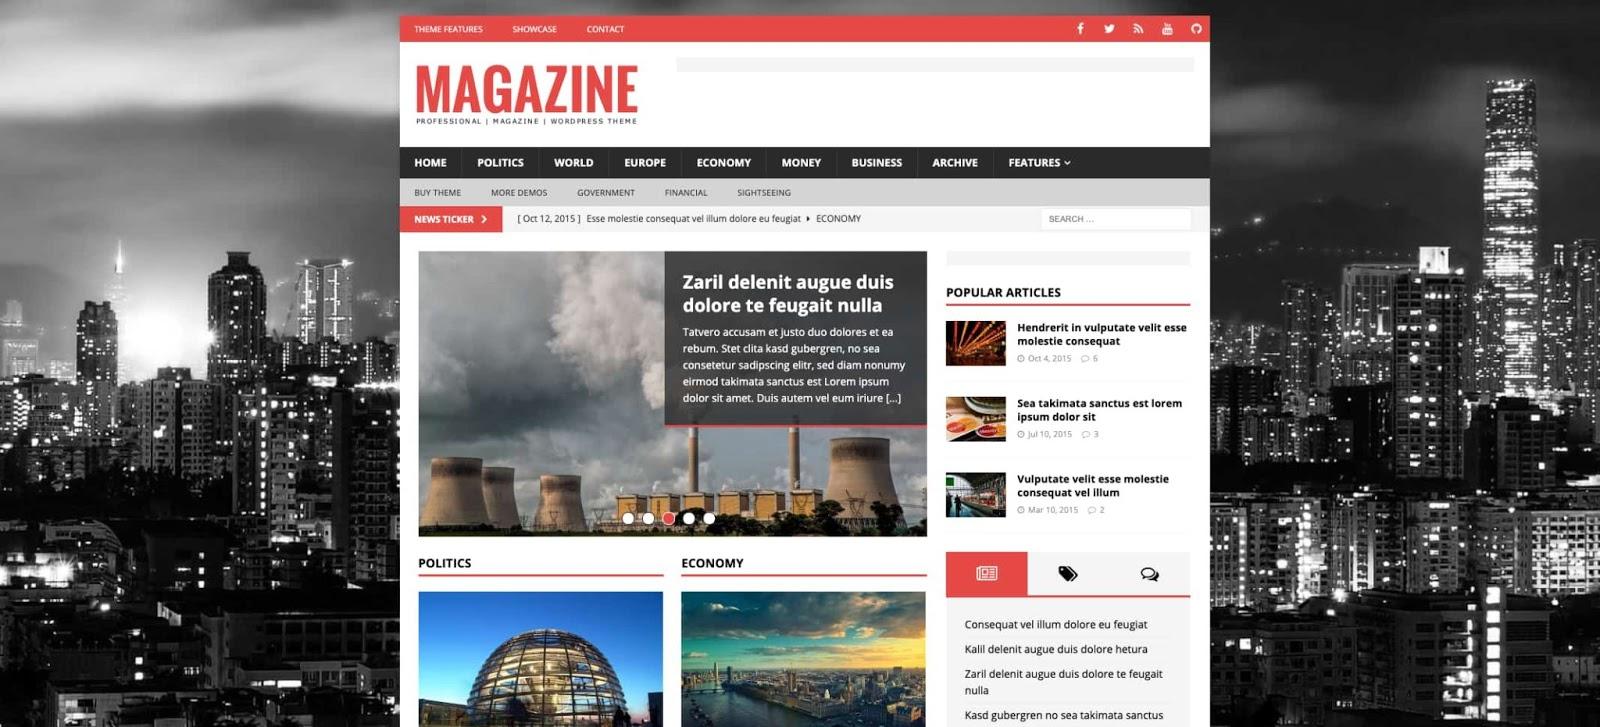 demo of the wordpress theme for adsense mh magazine